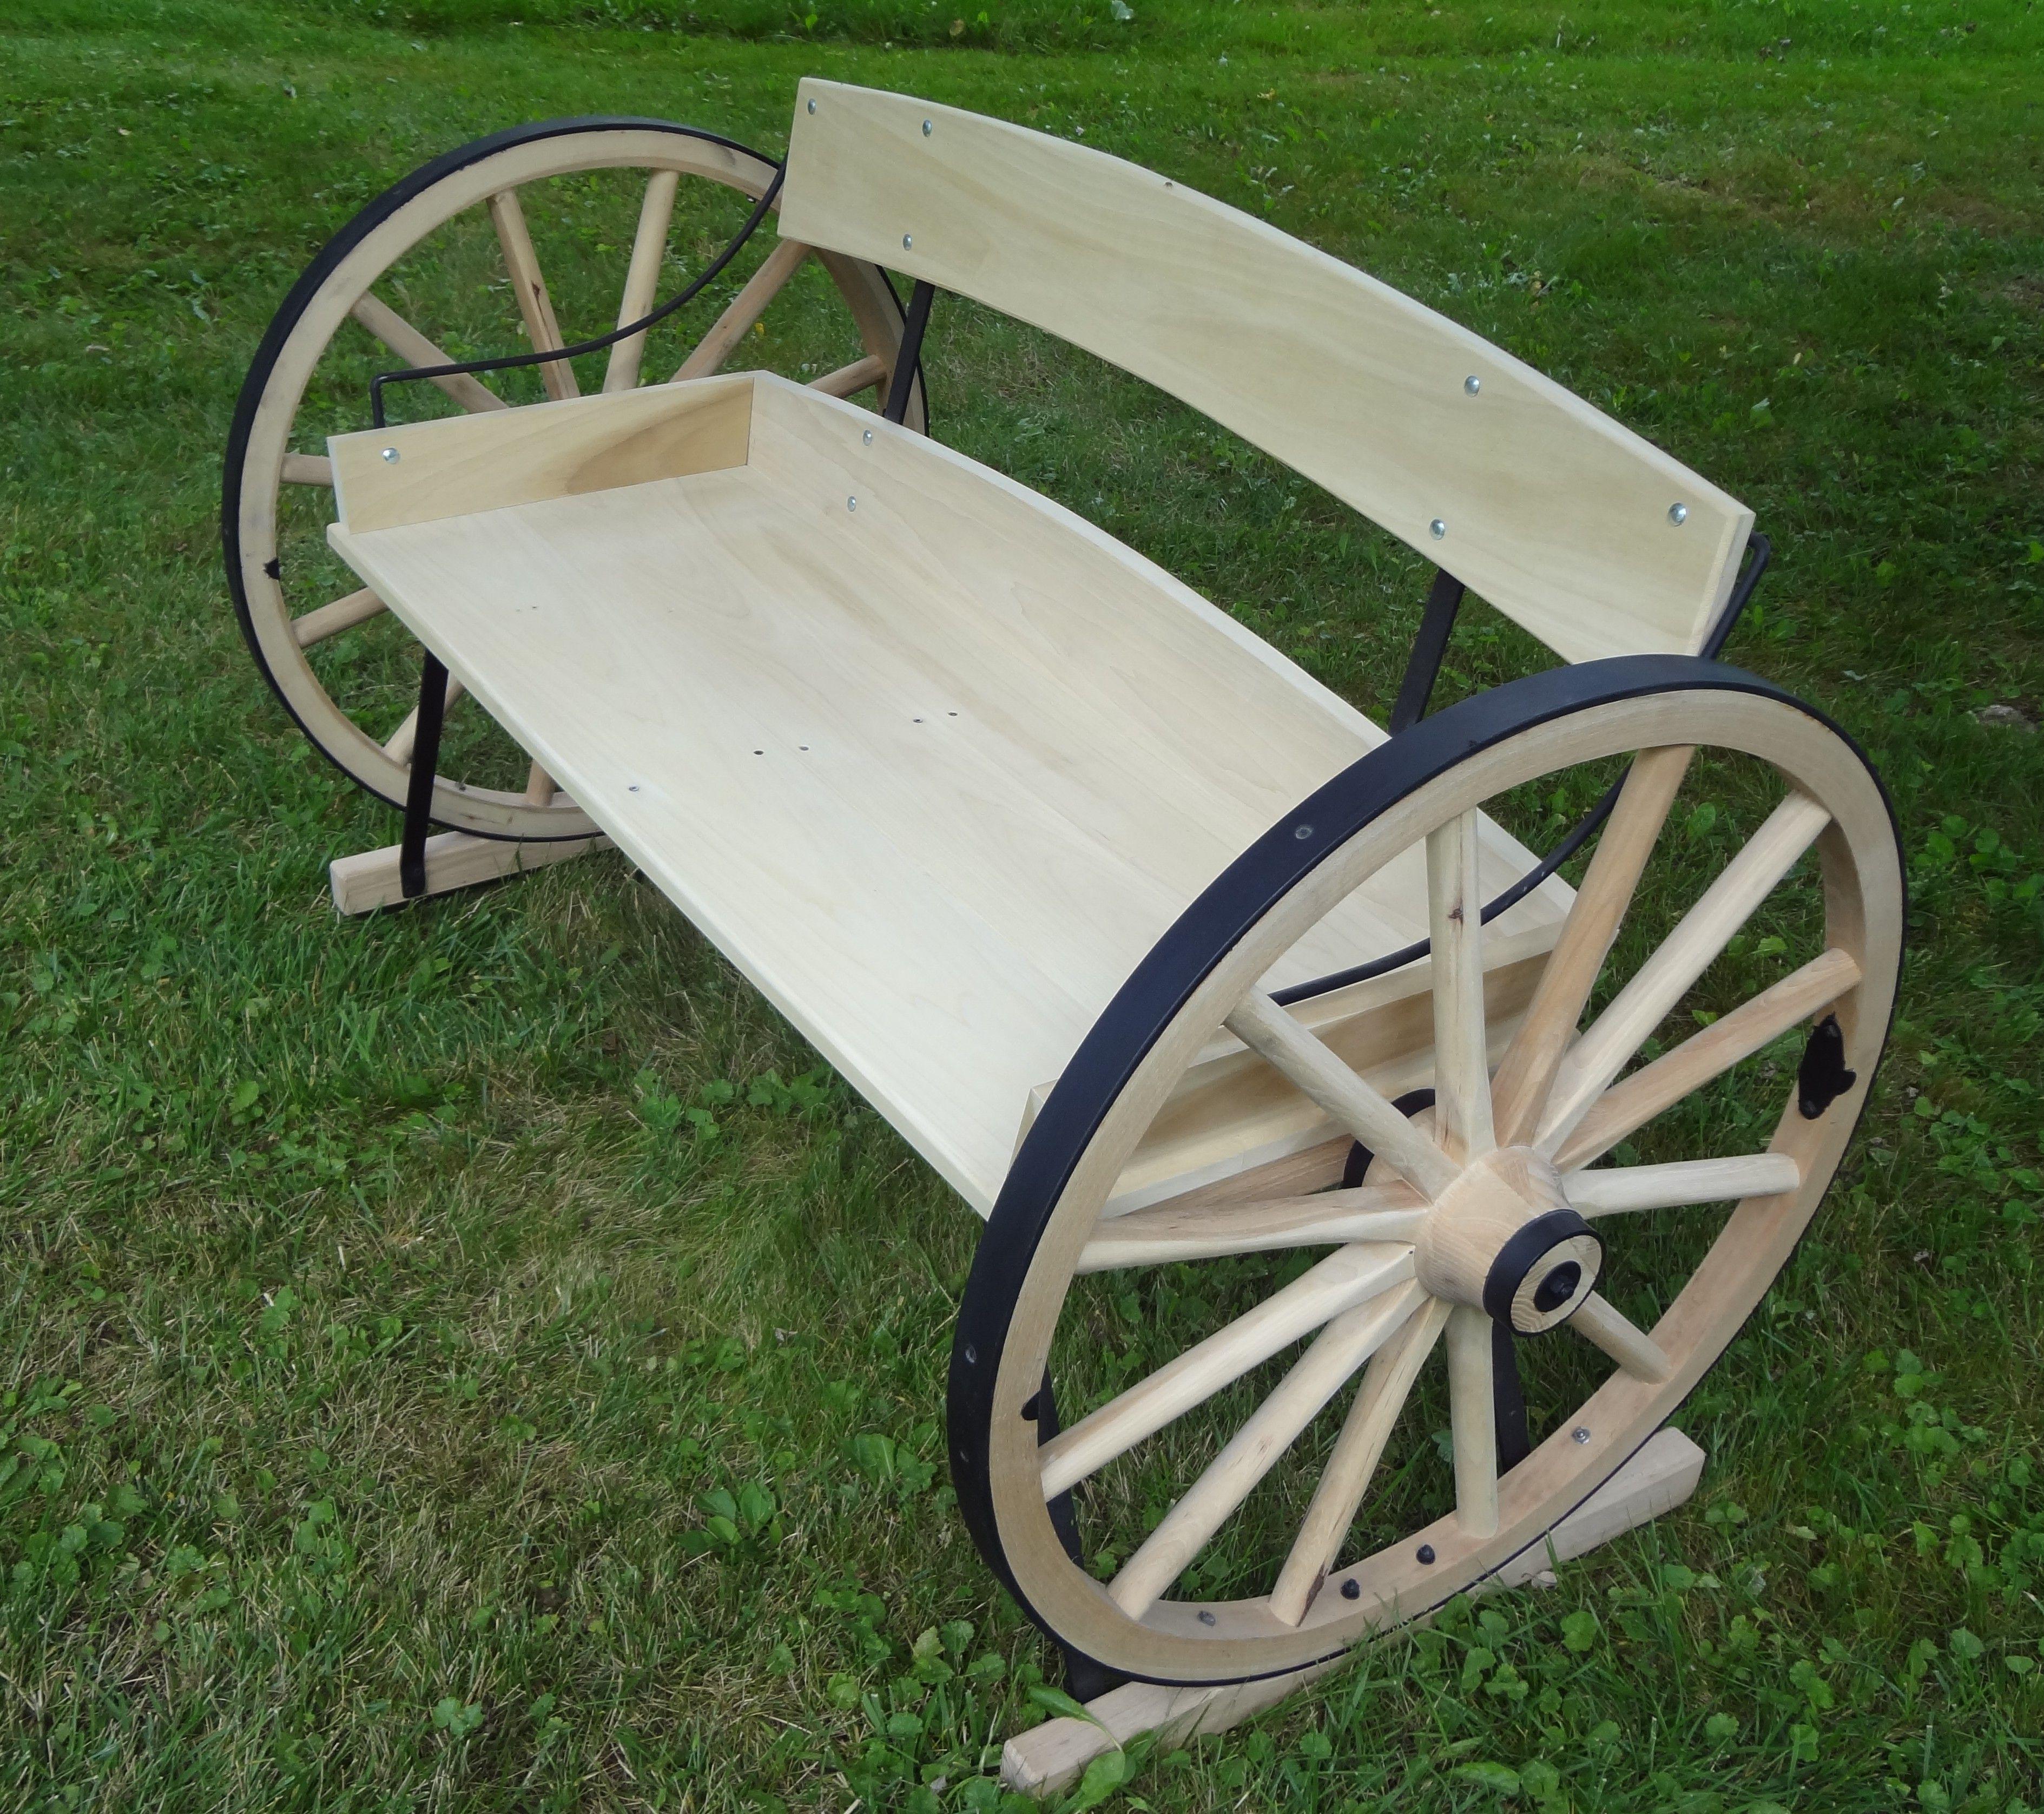 Wagon Wheel Bench In 2019 Goods Wagon Wheel Bench